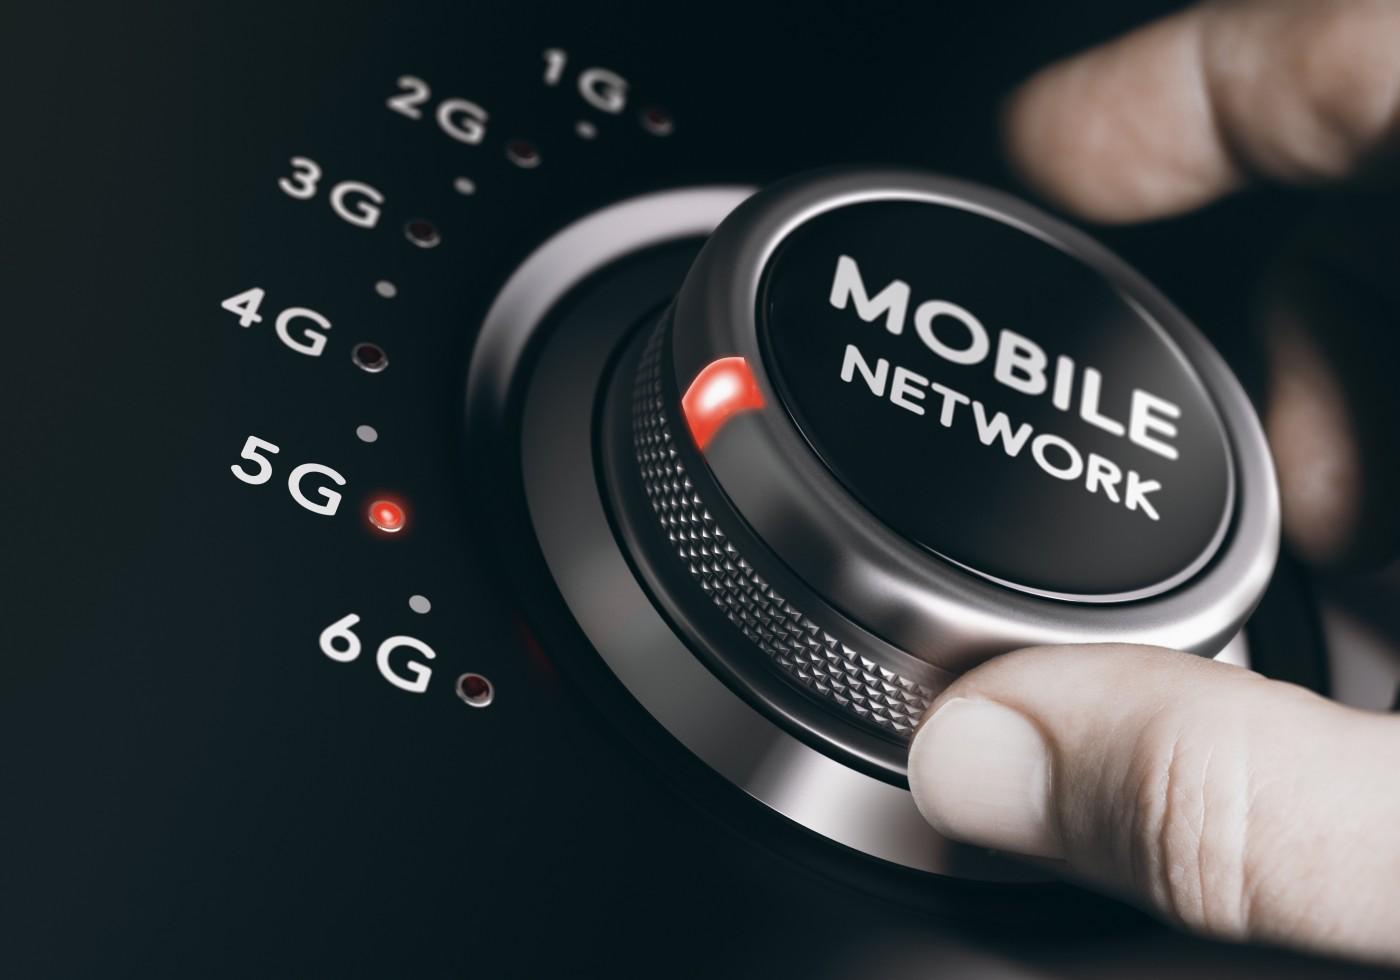 5G建造費用貴,諾基亞從後端省成本,提升光纖網路流量